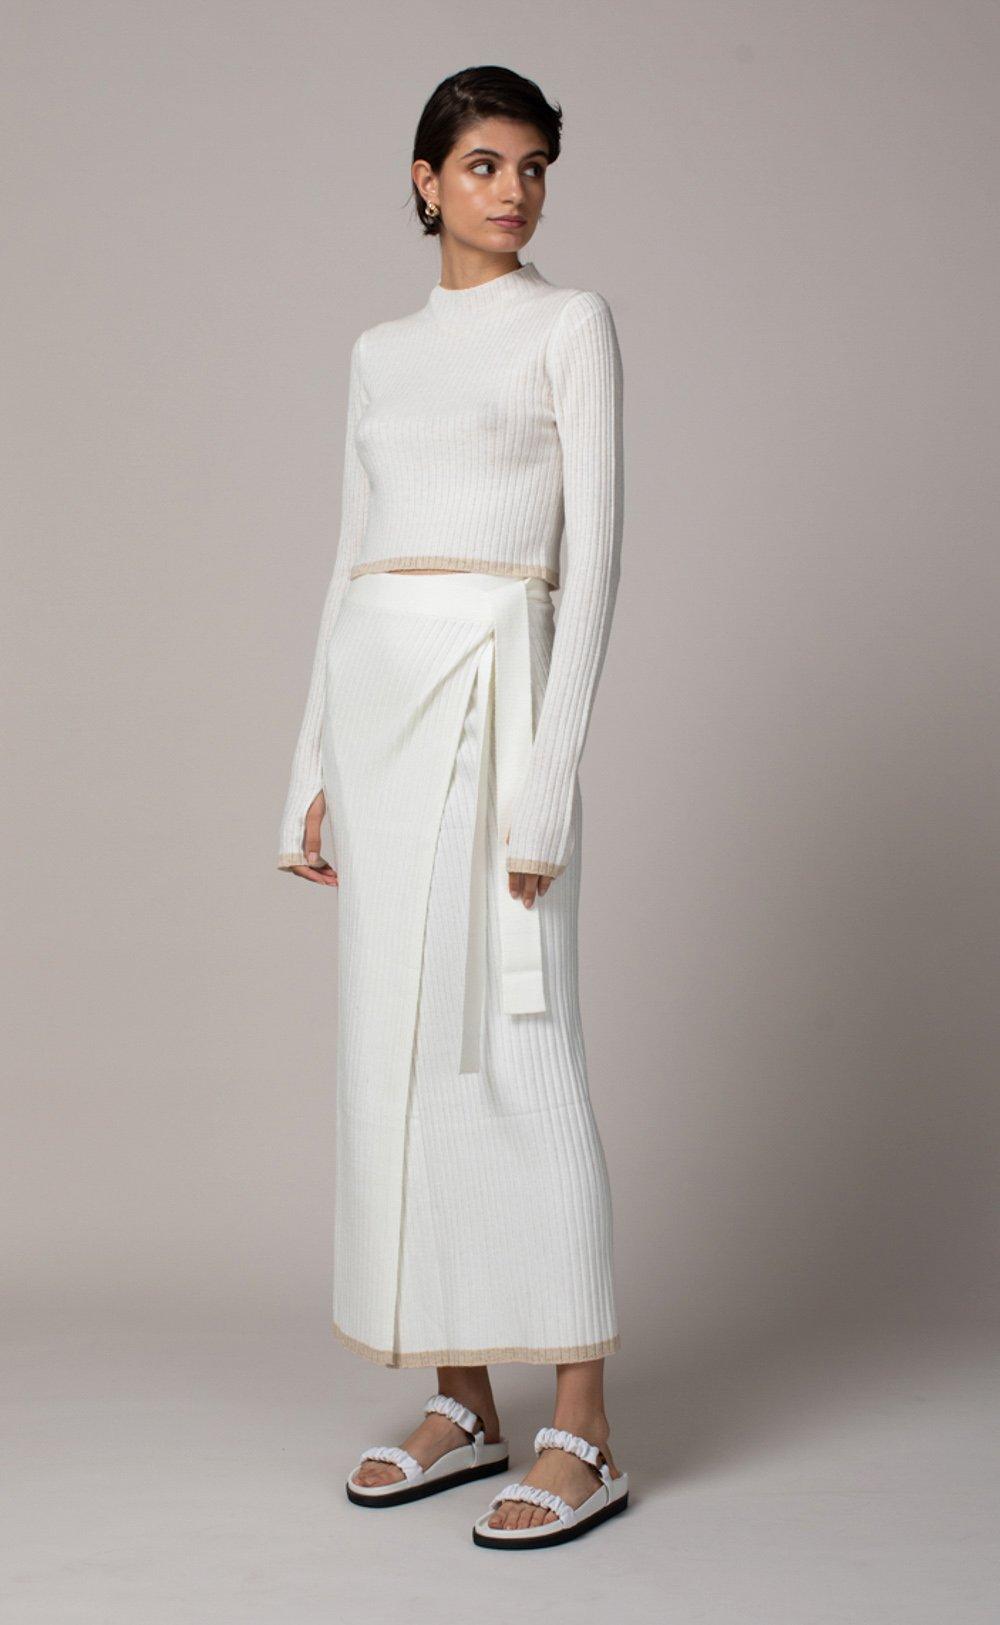 SINCLAIR WRAP SKIRT by Bec and Bridge, available on becandbridge.com.au for $200 Natasha Oakley Skirt Exact Product